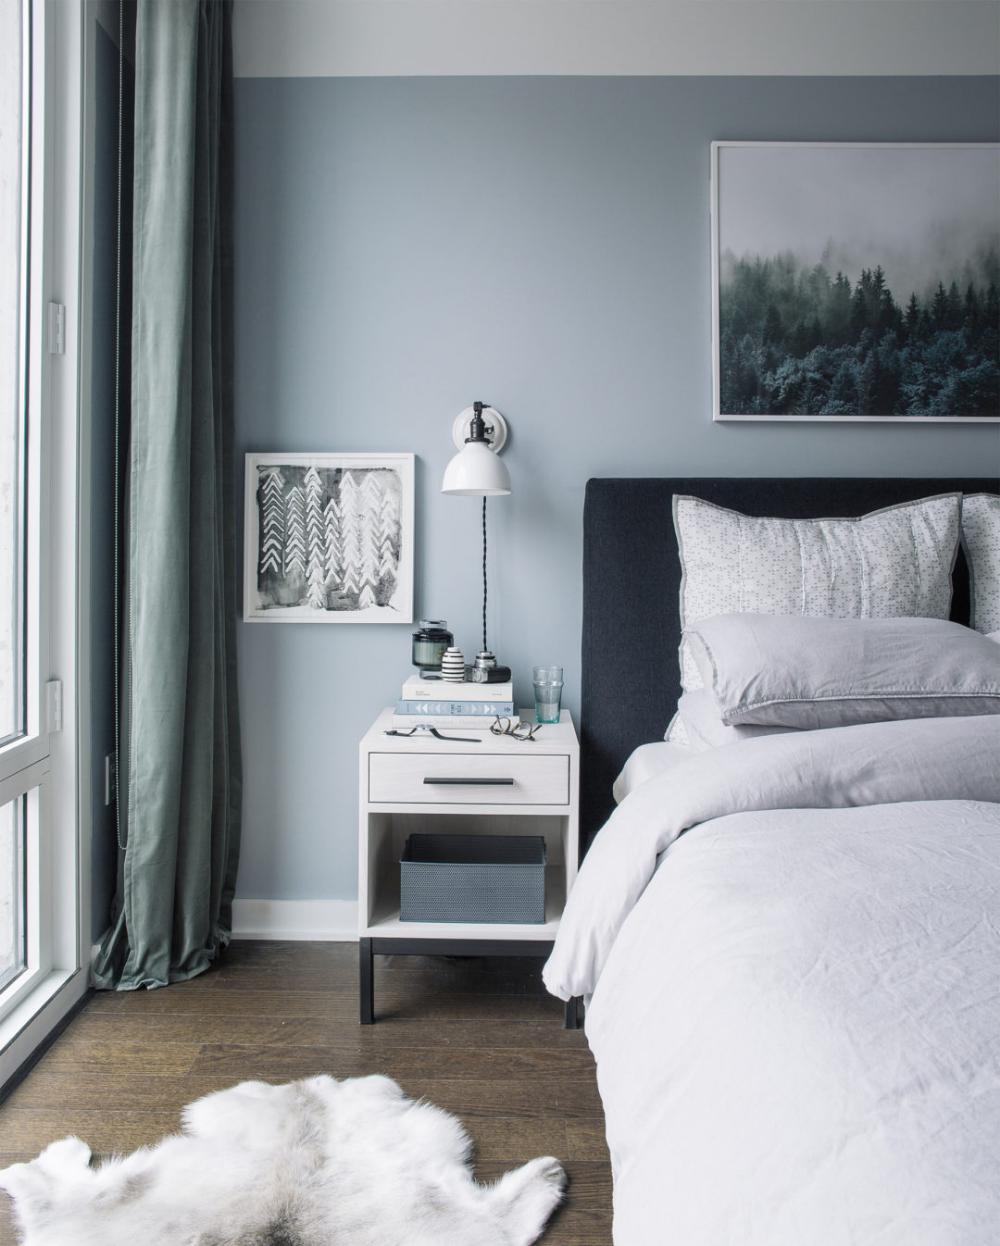 Bedroom Makeover The Reveal Bright Bazaar By Will Taylor Blue Bedroom Walls Blue Bedroom Decor Serene Bedroom